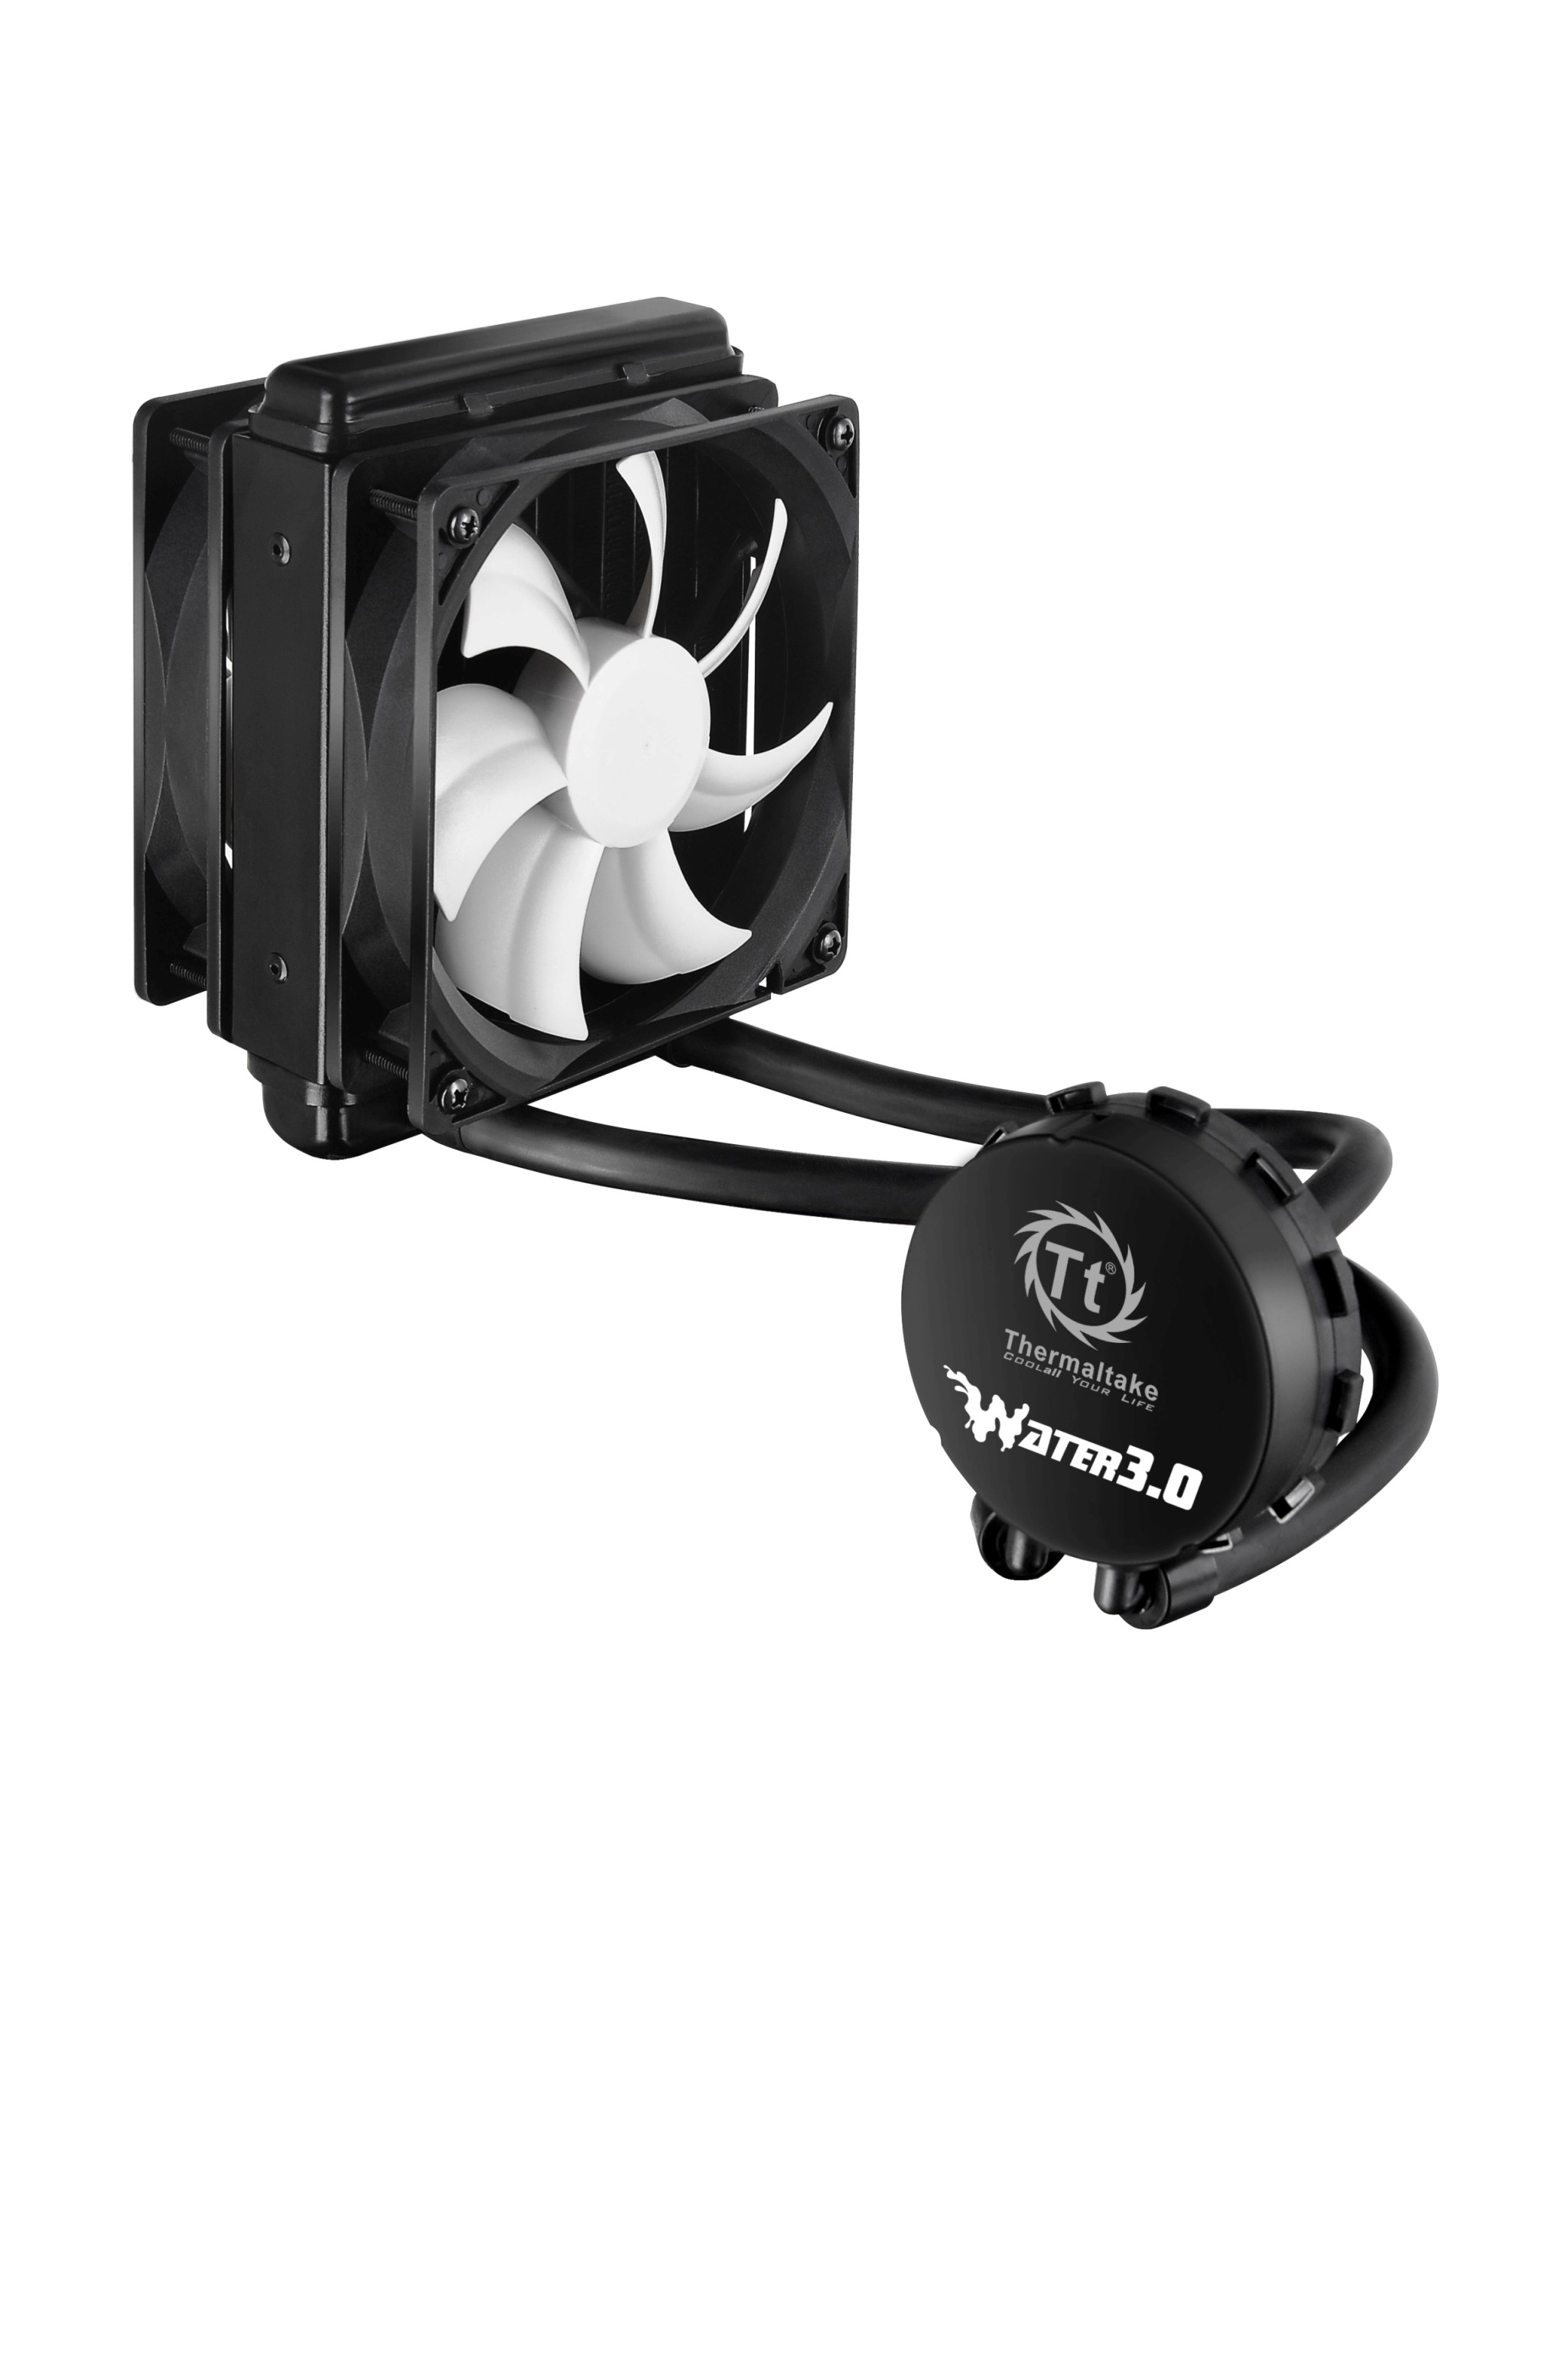 Thermaltake Water 3.0 Performer LCS